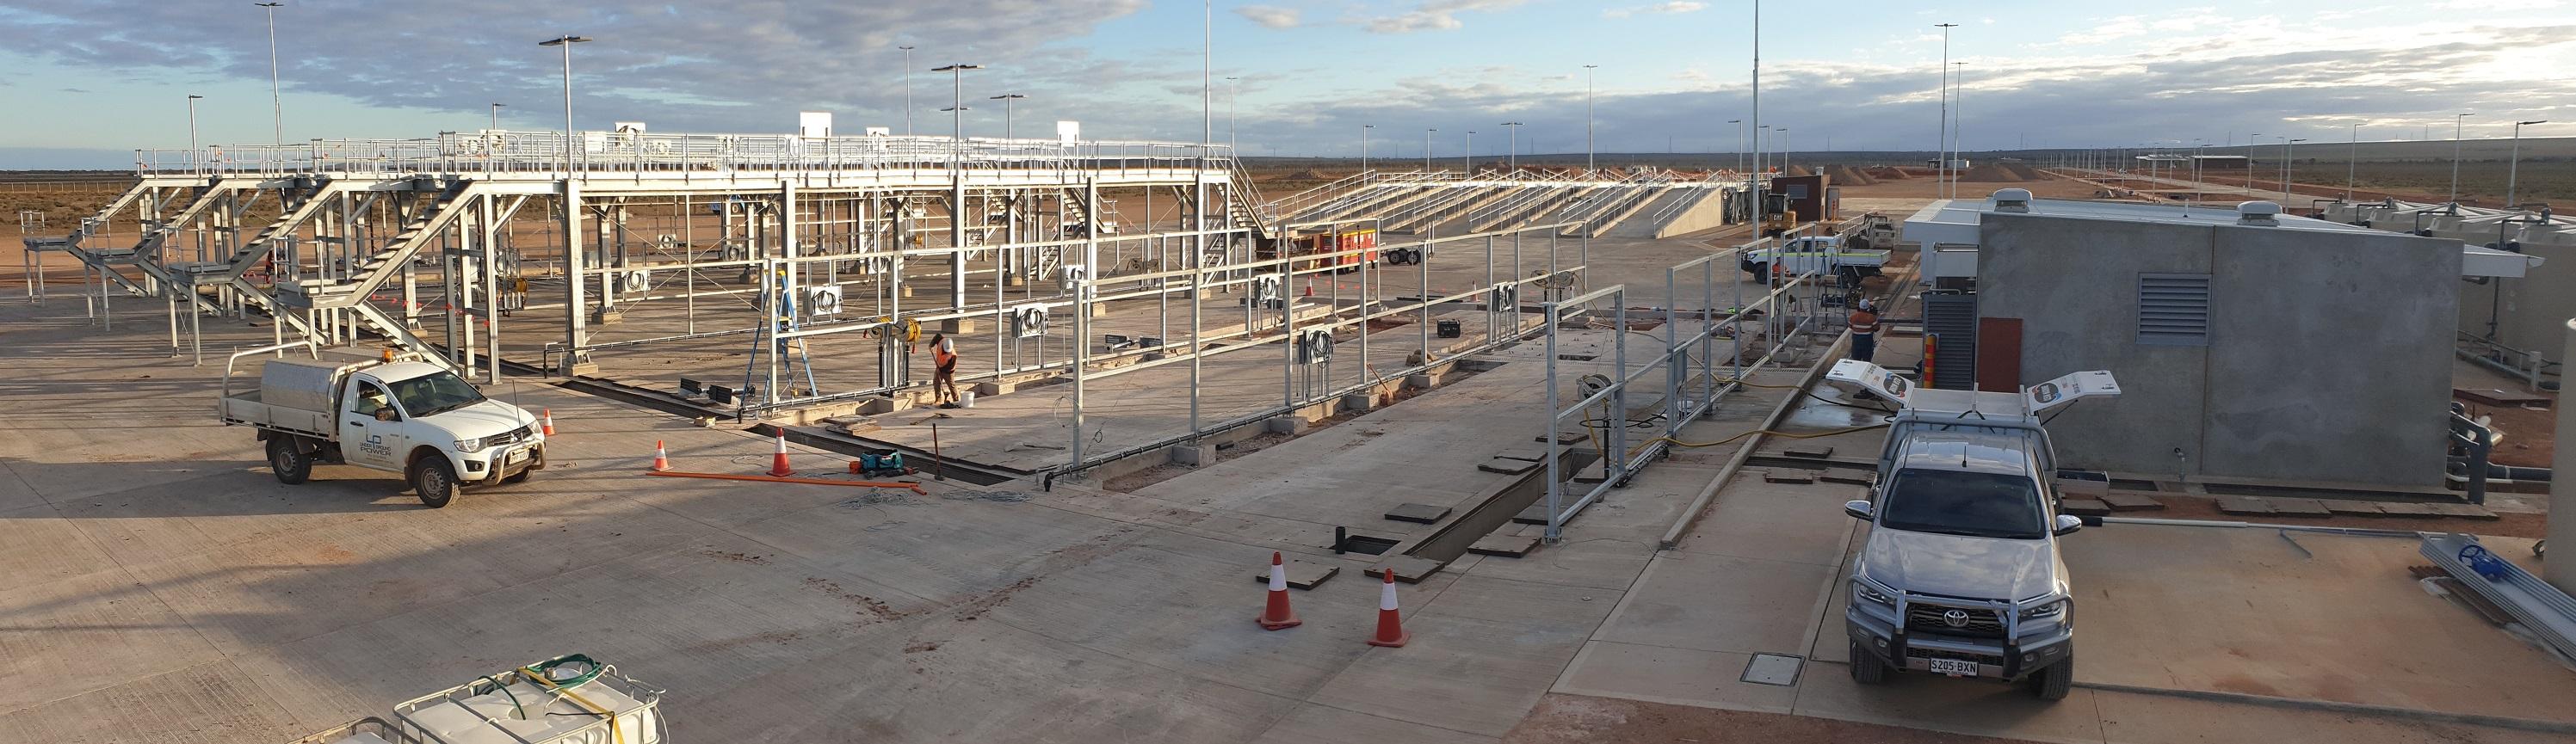 Australia's largest wash bay at Cultana